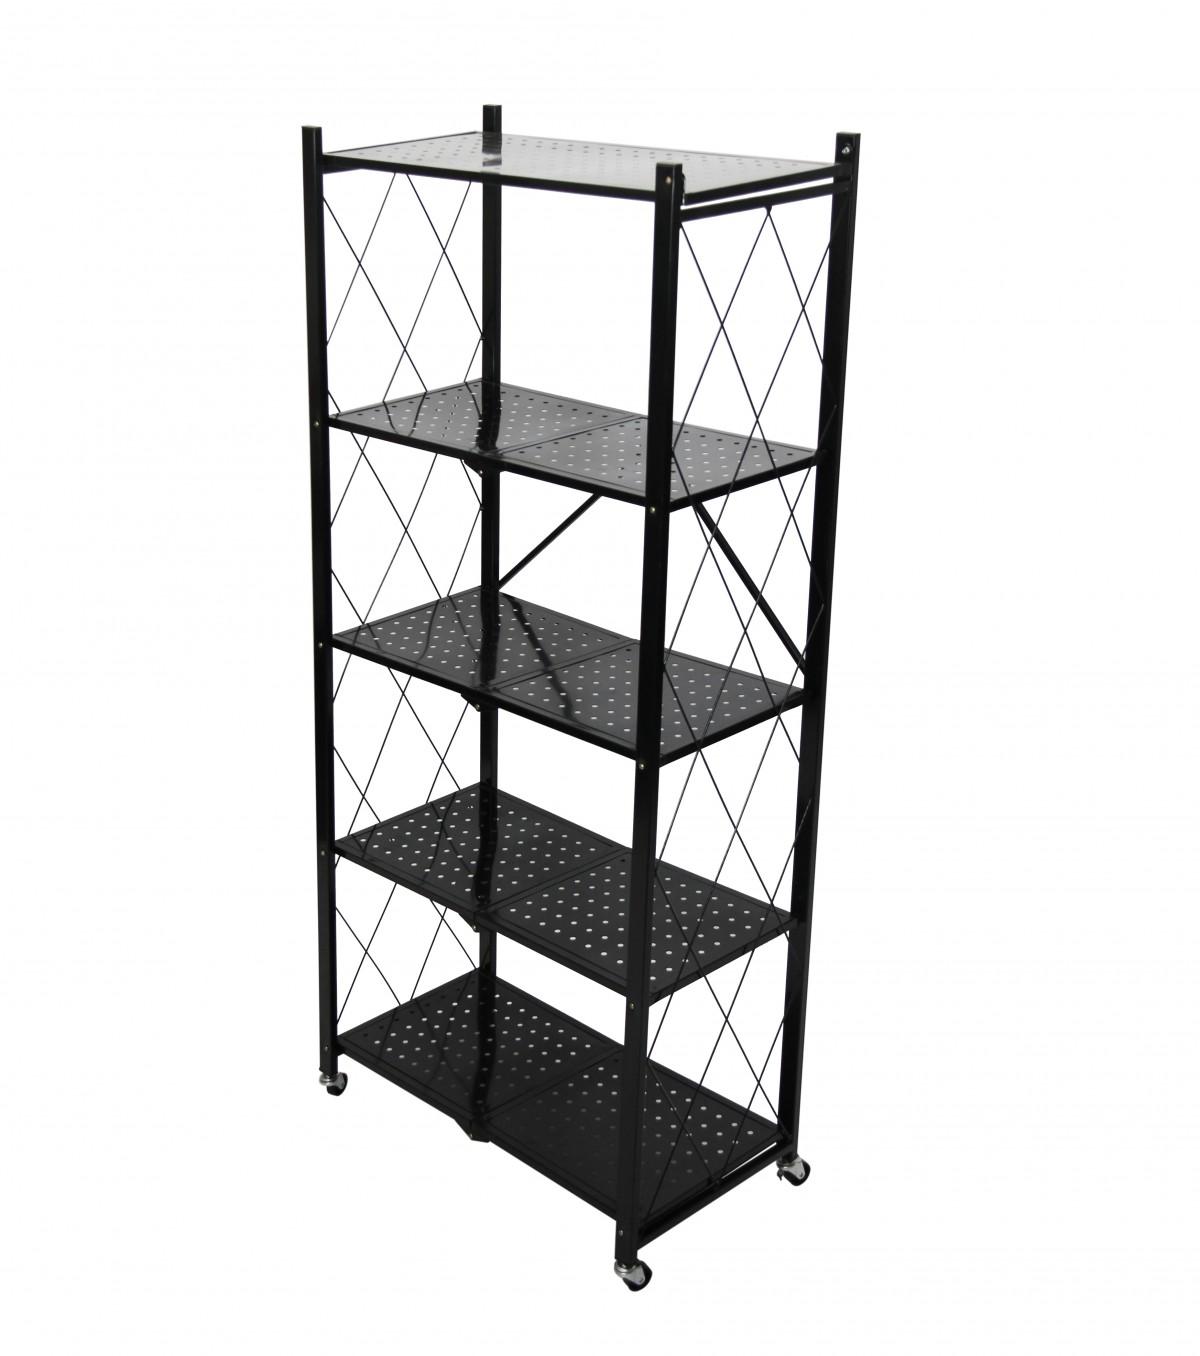 Fine Living Foldable Storage Rack-Black Metal 5 La